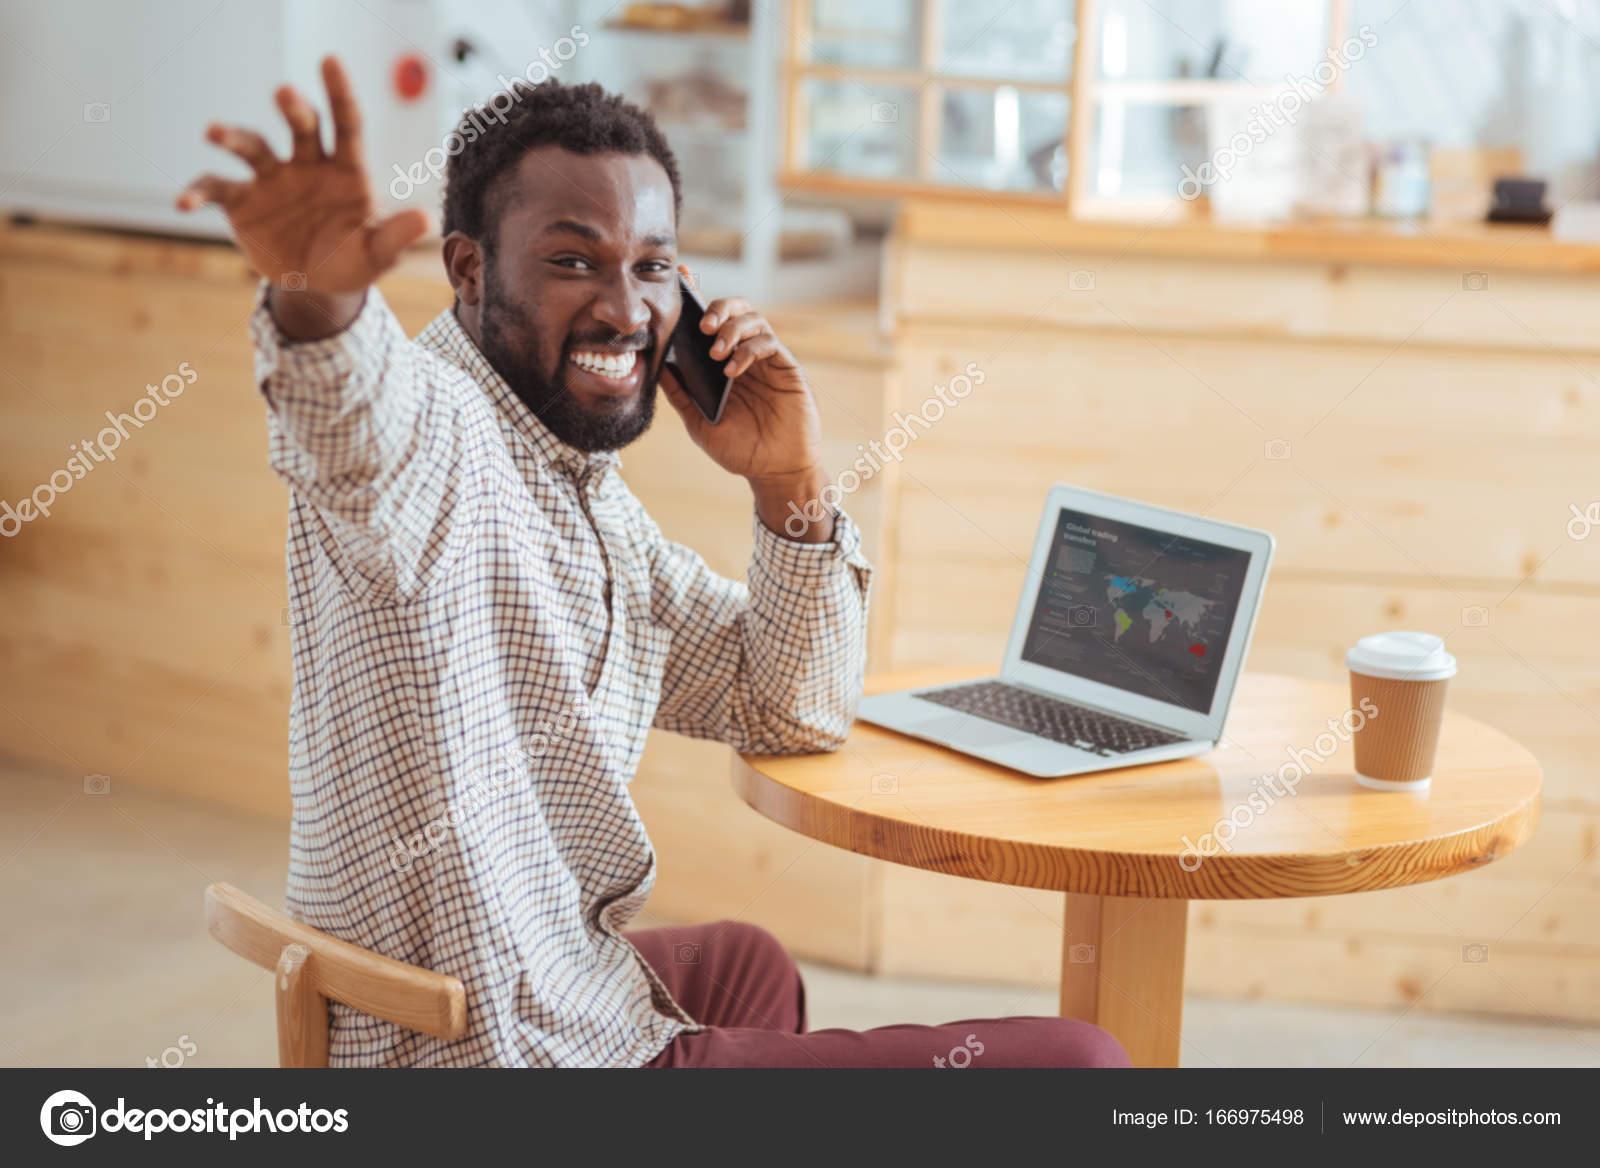 Overjoyed Man Greeting Someone While Talking On Phone Stock Photo